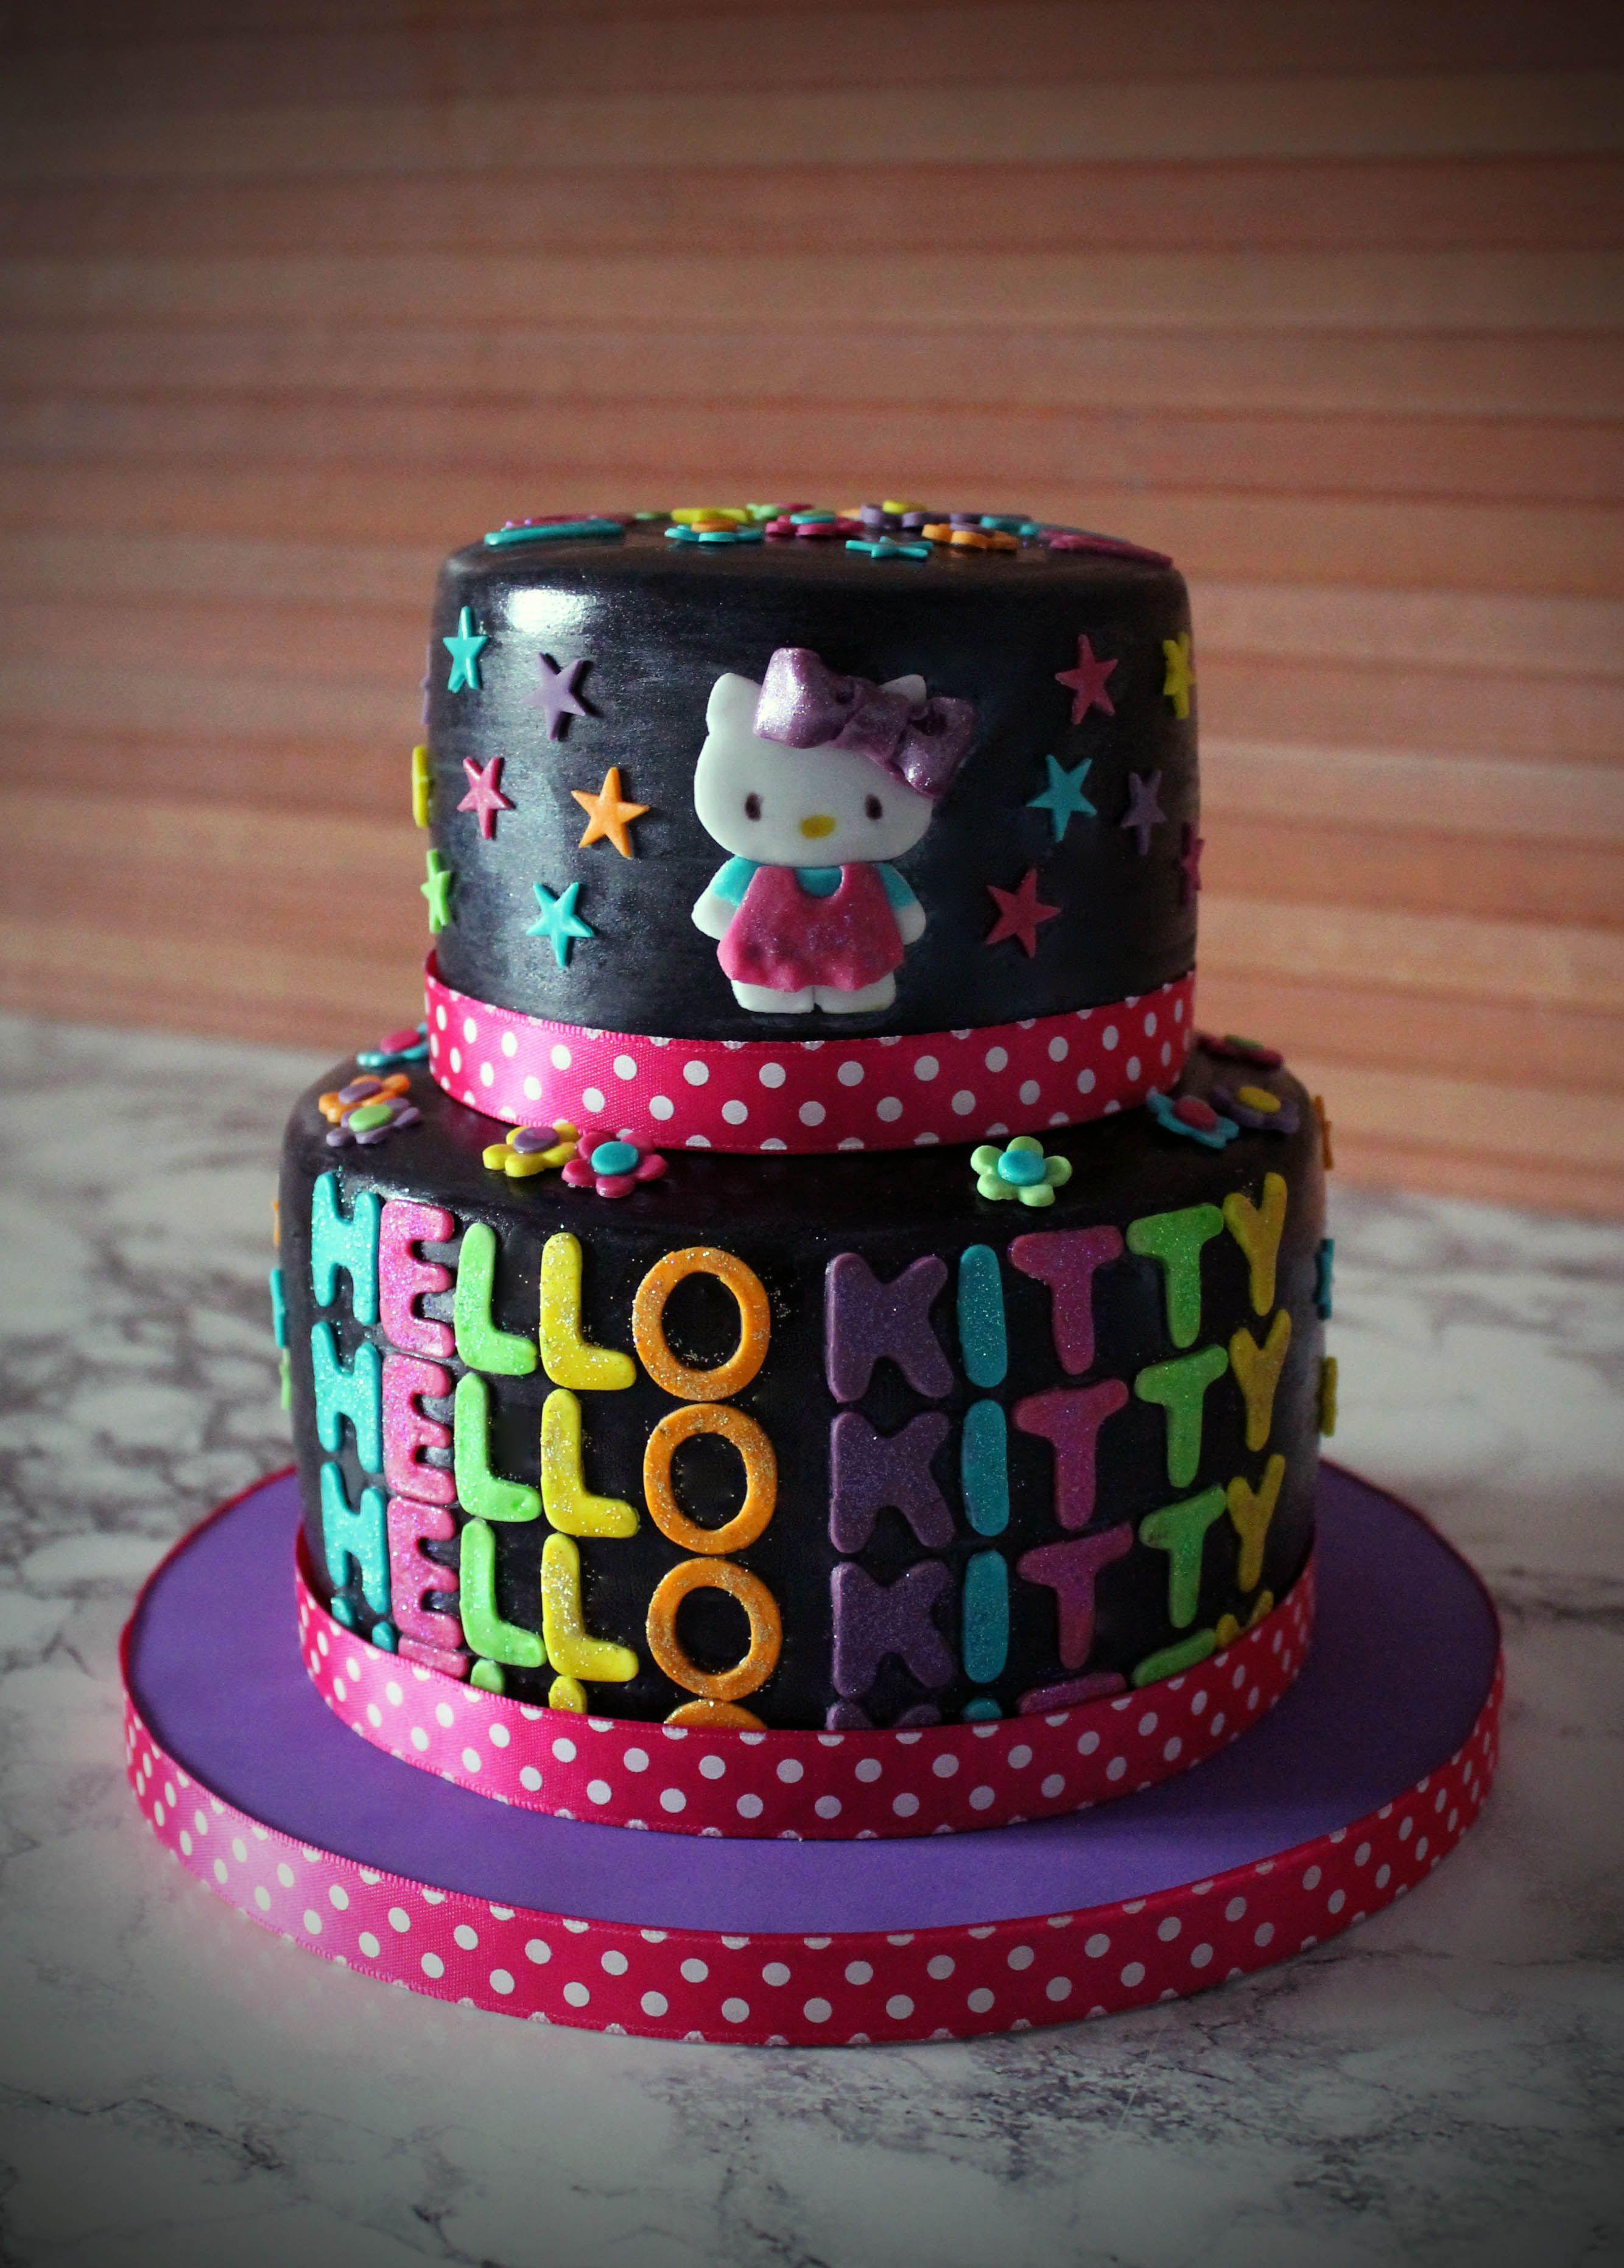 Hello Kitty Neon Birthday Cake Wwwsweetlittlebitesinfo Sweet - Neon birthday party cakes